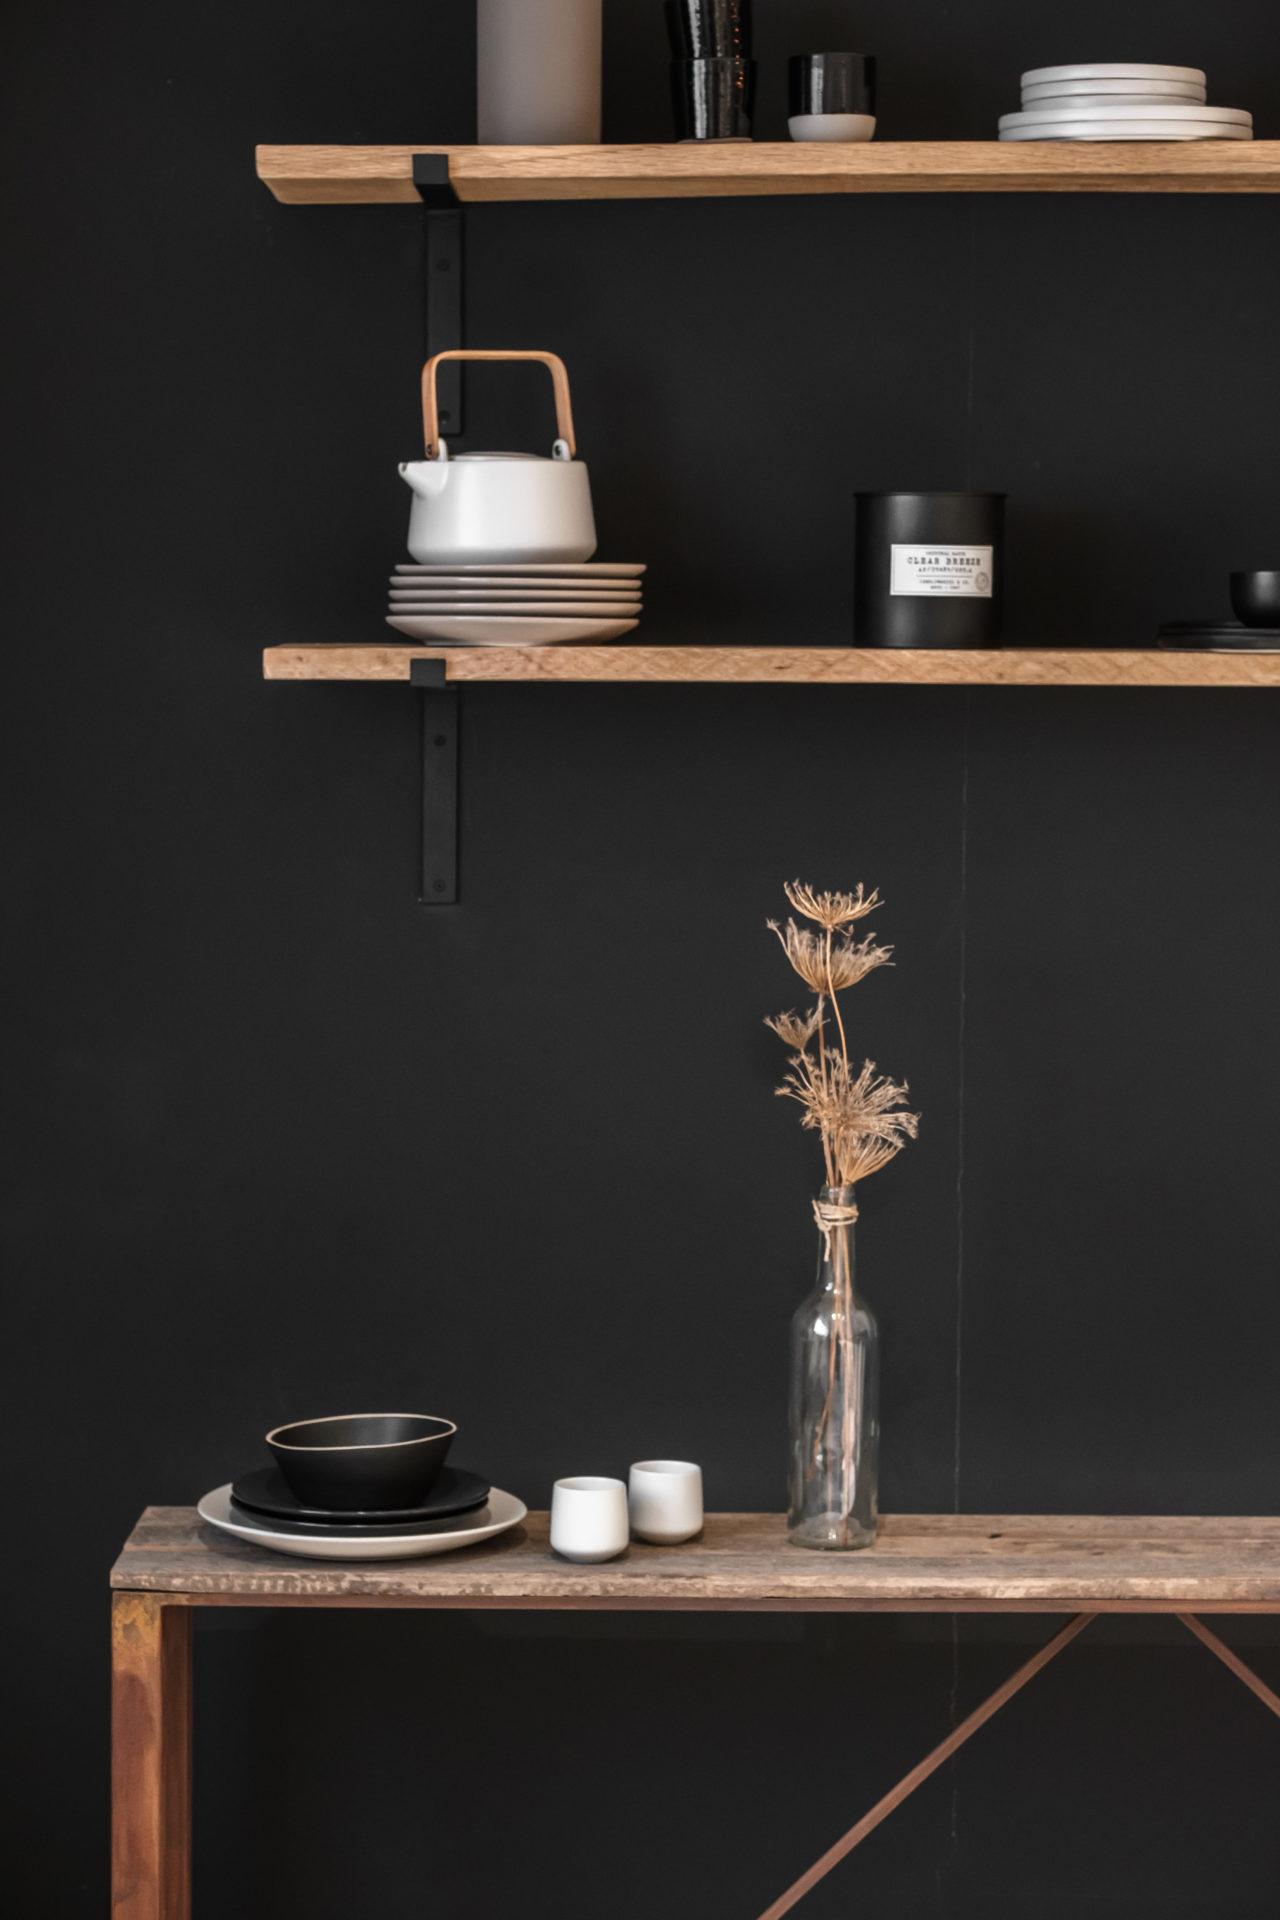 kitchen design - The urban kitchen by KITMO